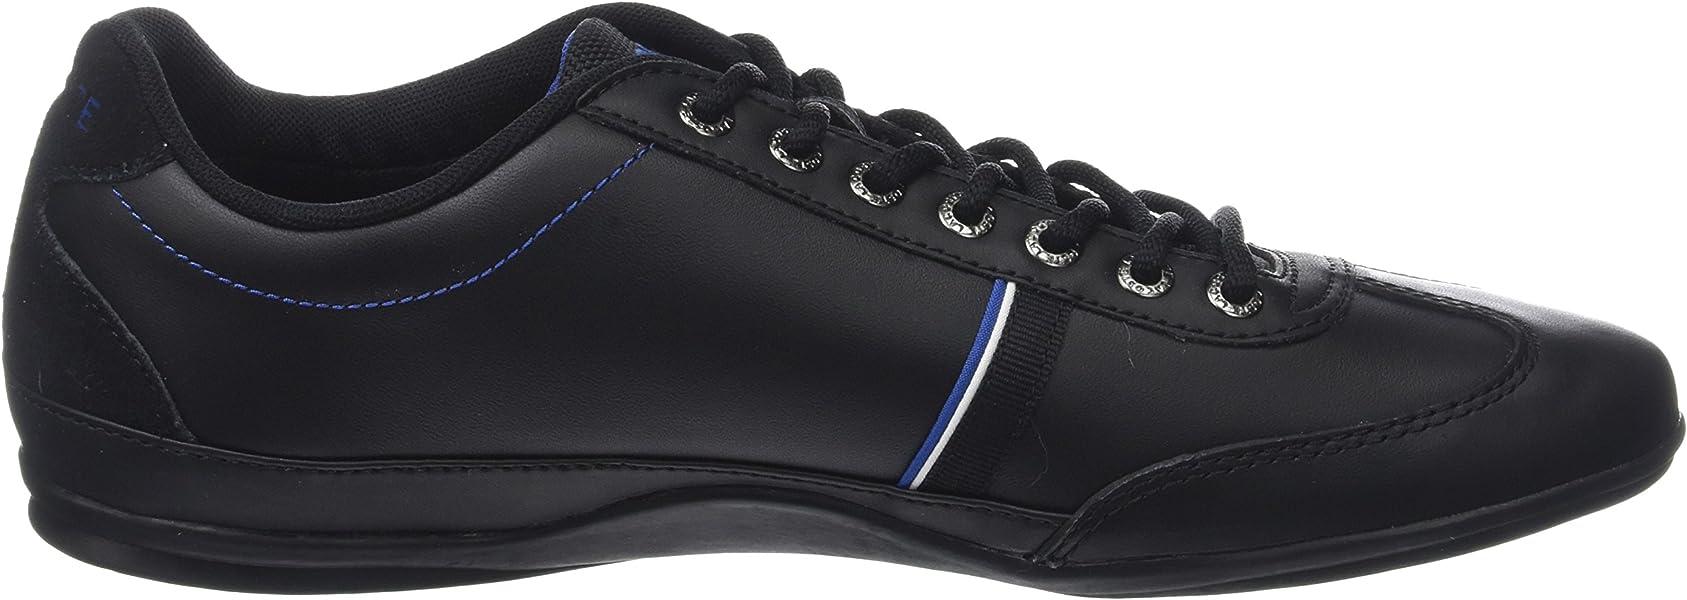 9e4c0f888d779d Lacoste Herren Misano Sport 118 1 Cam Sneaker